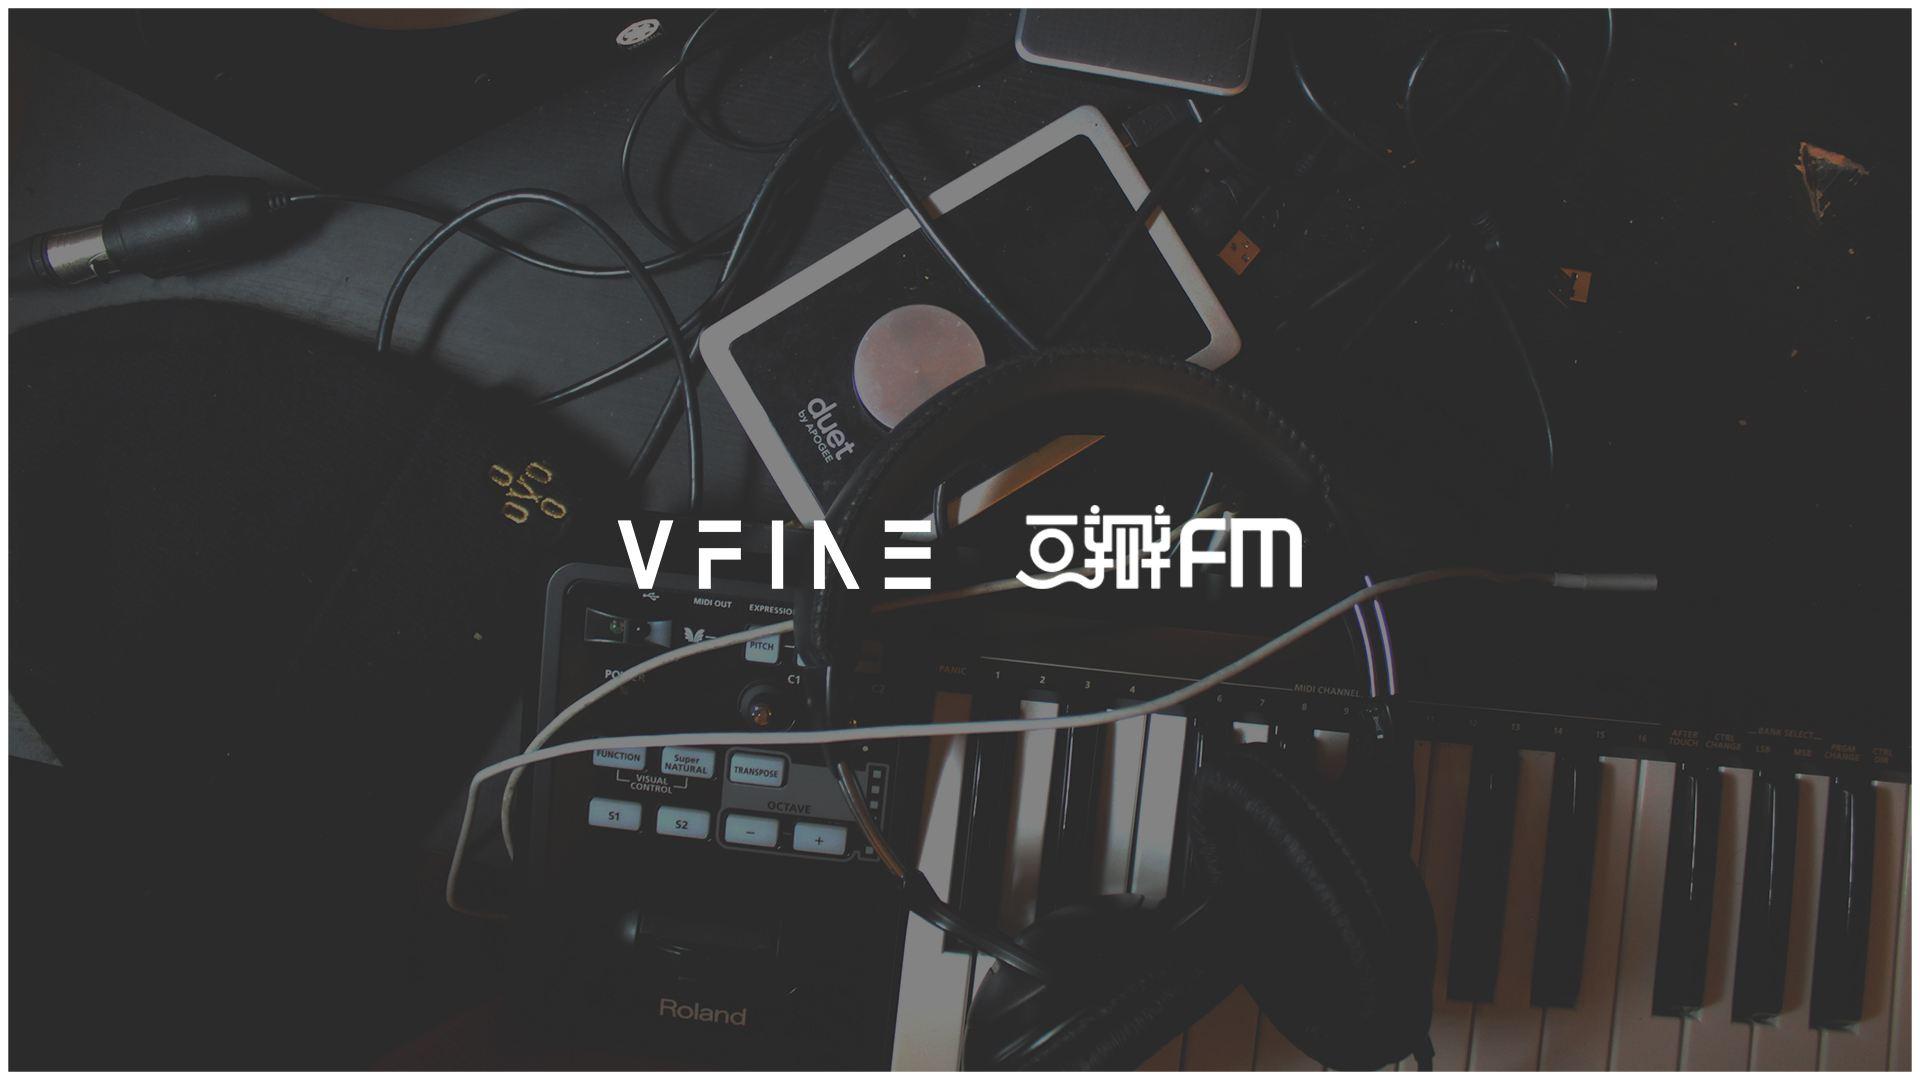 tube8日本动漫_据悉,vfine受lullatone委托,要求papitube赔偿音乐版权方经济损失及